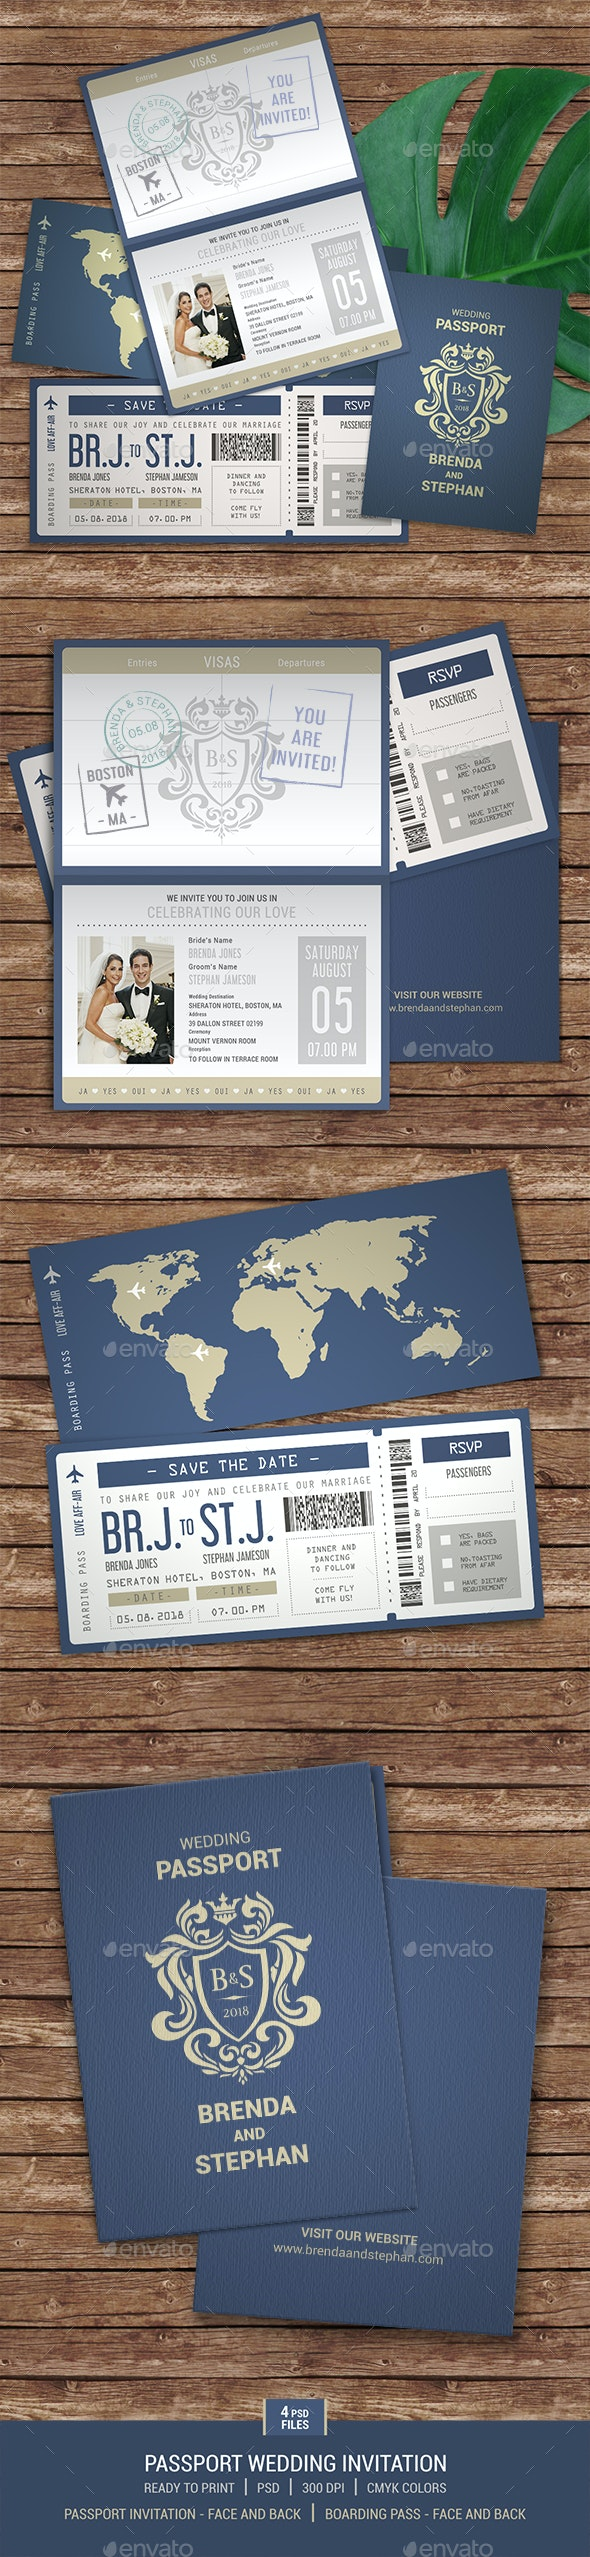 Passport Wedding Invitation - Weddings Cards & Invites